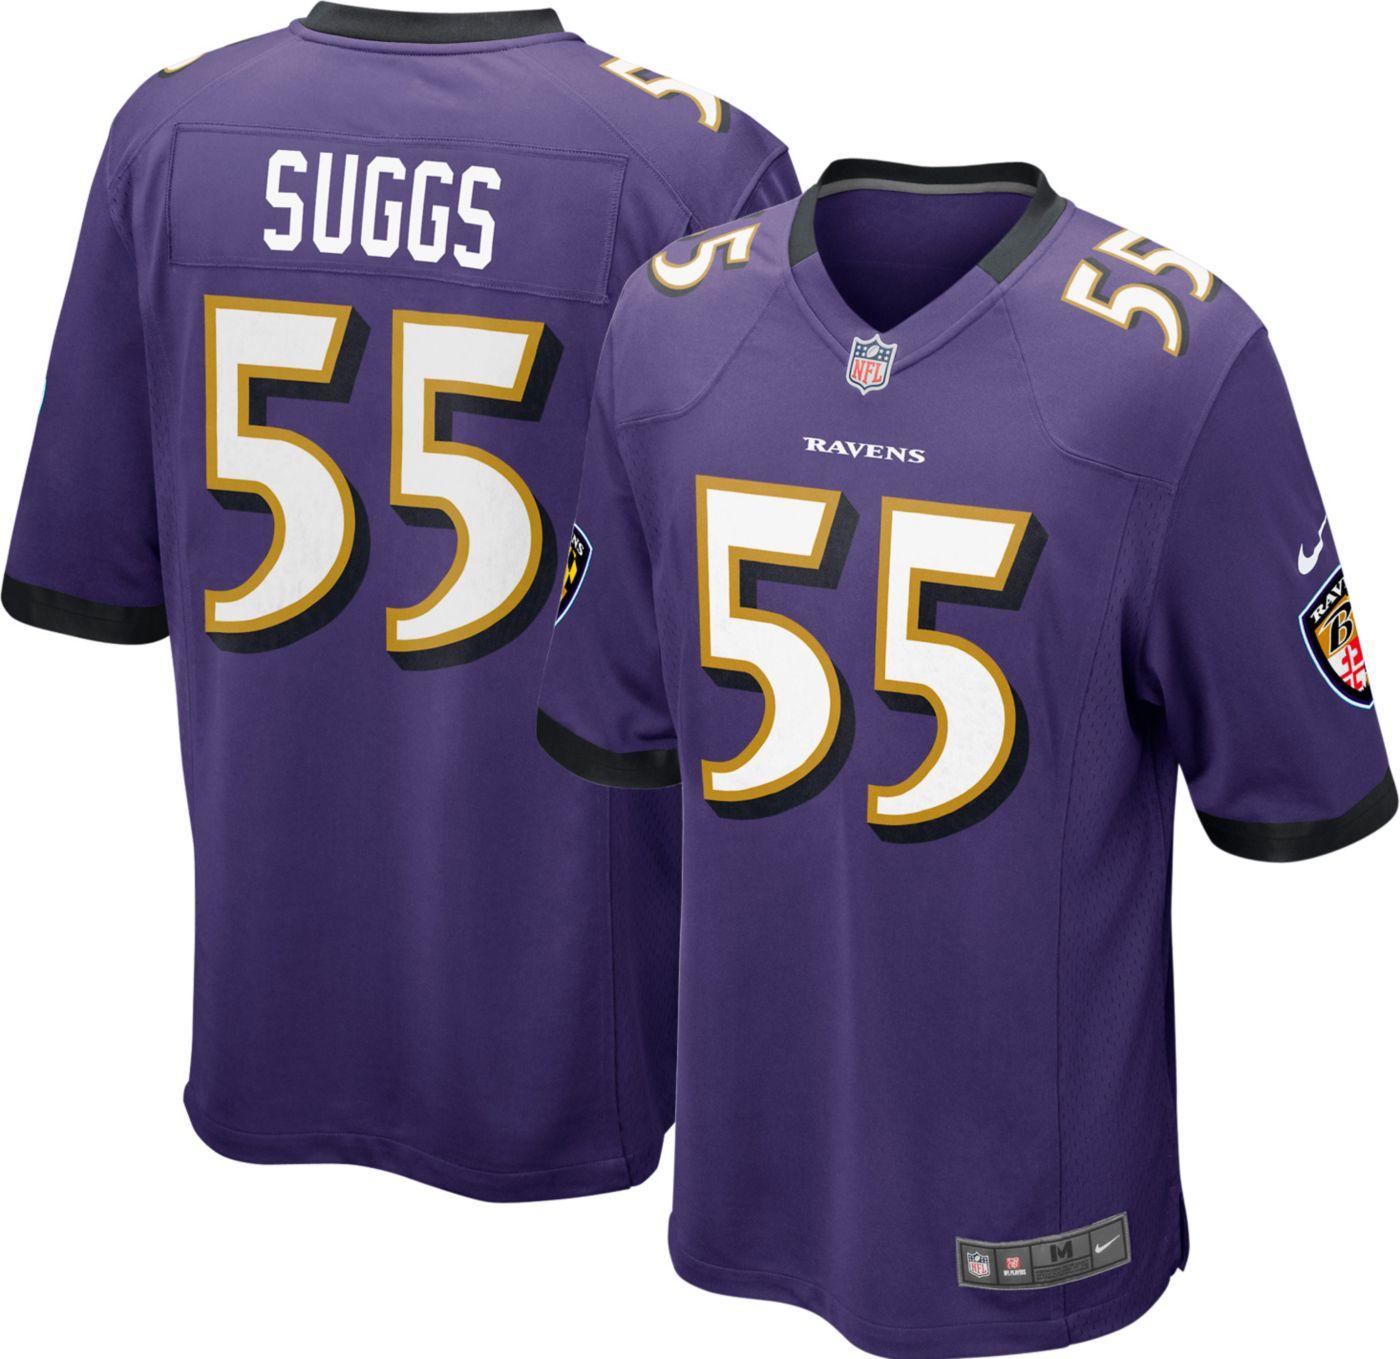 Nike Men's Home Game Jersey Baltimore Ravens Terrell Suggs #55